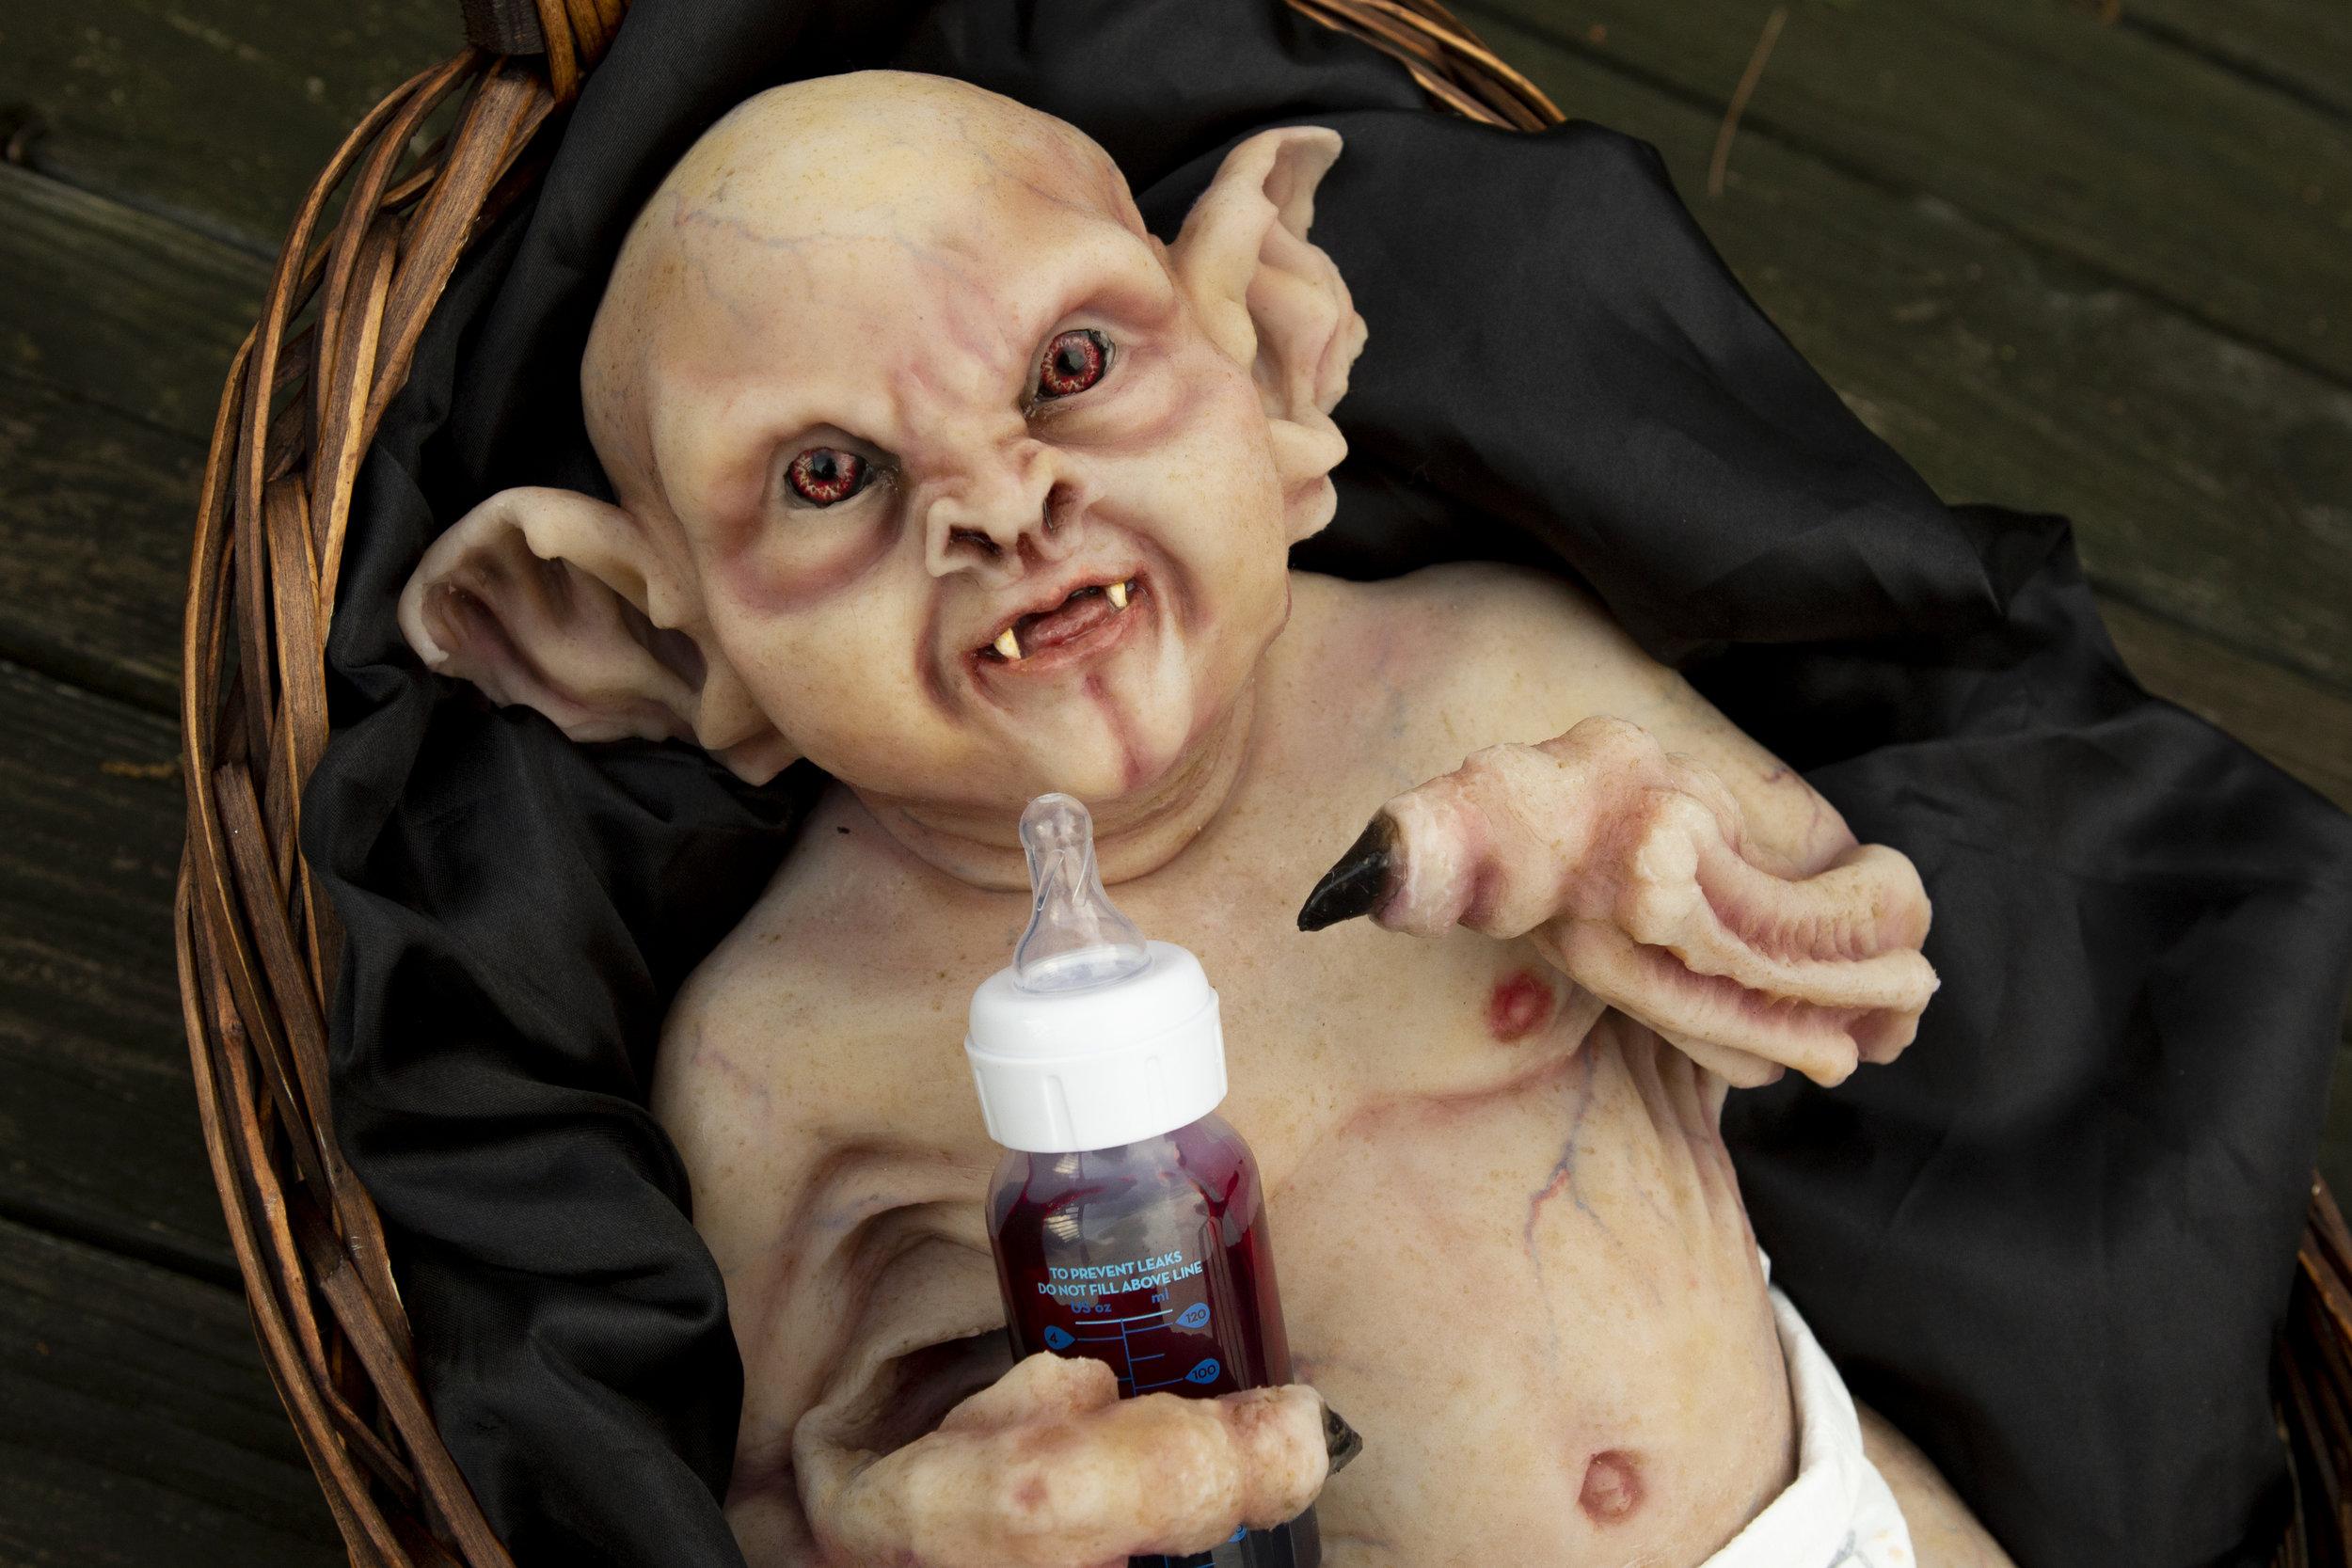 Baby in A Basket  | Newborn Vampire  | Newborn photoshoot | Ravendark Creations Vampire Baby | Newborn Photoshoots | Alyssia Booth's Candid & Studio | www.abcandidstudio.com